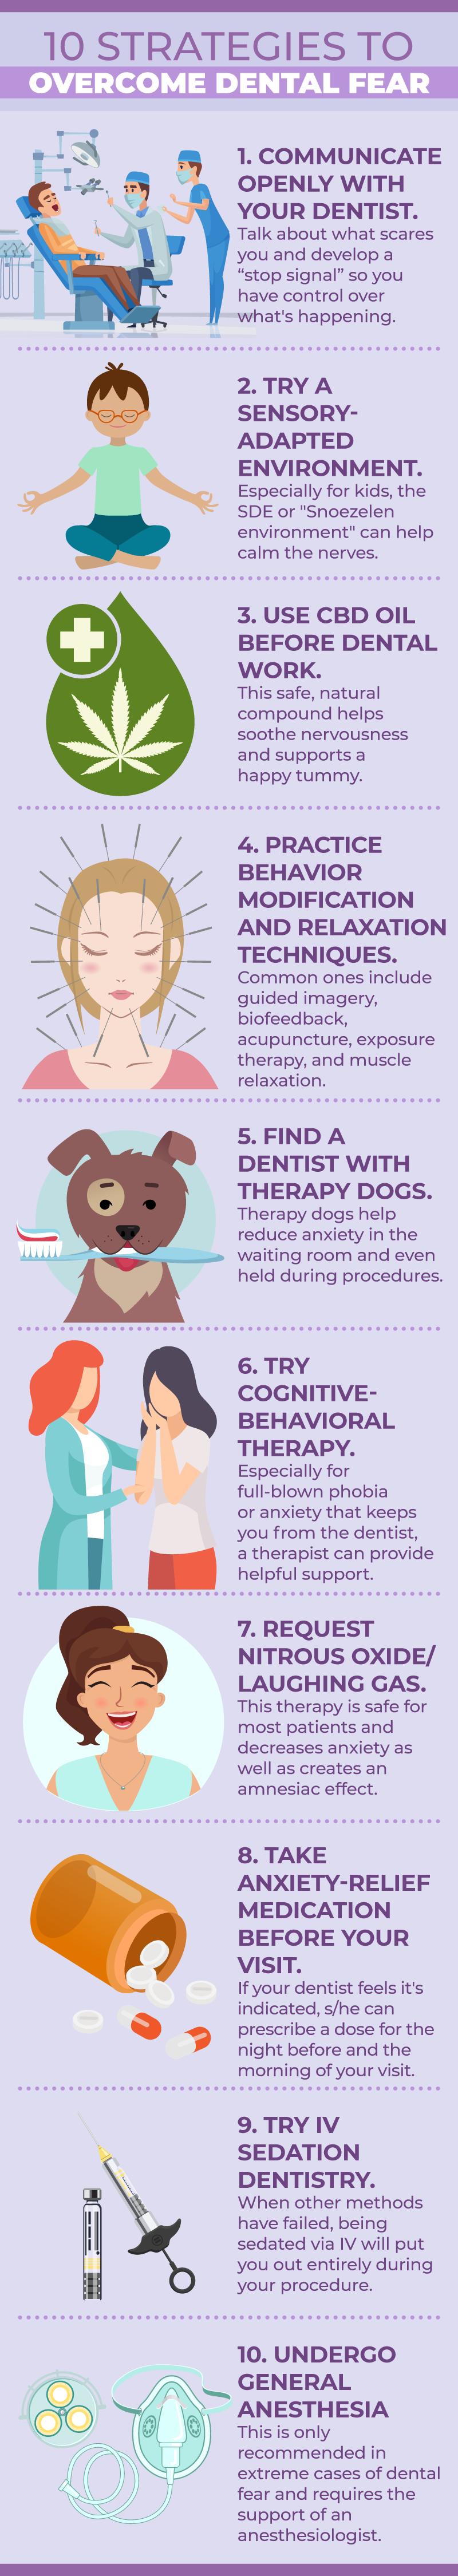 ways-to-fix-dental-anxiety-fear